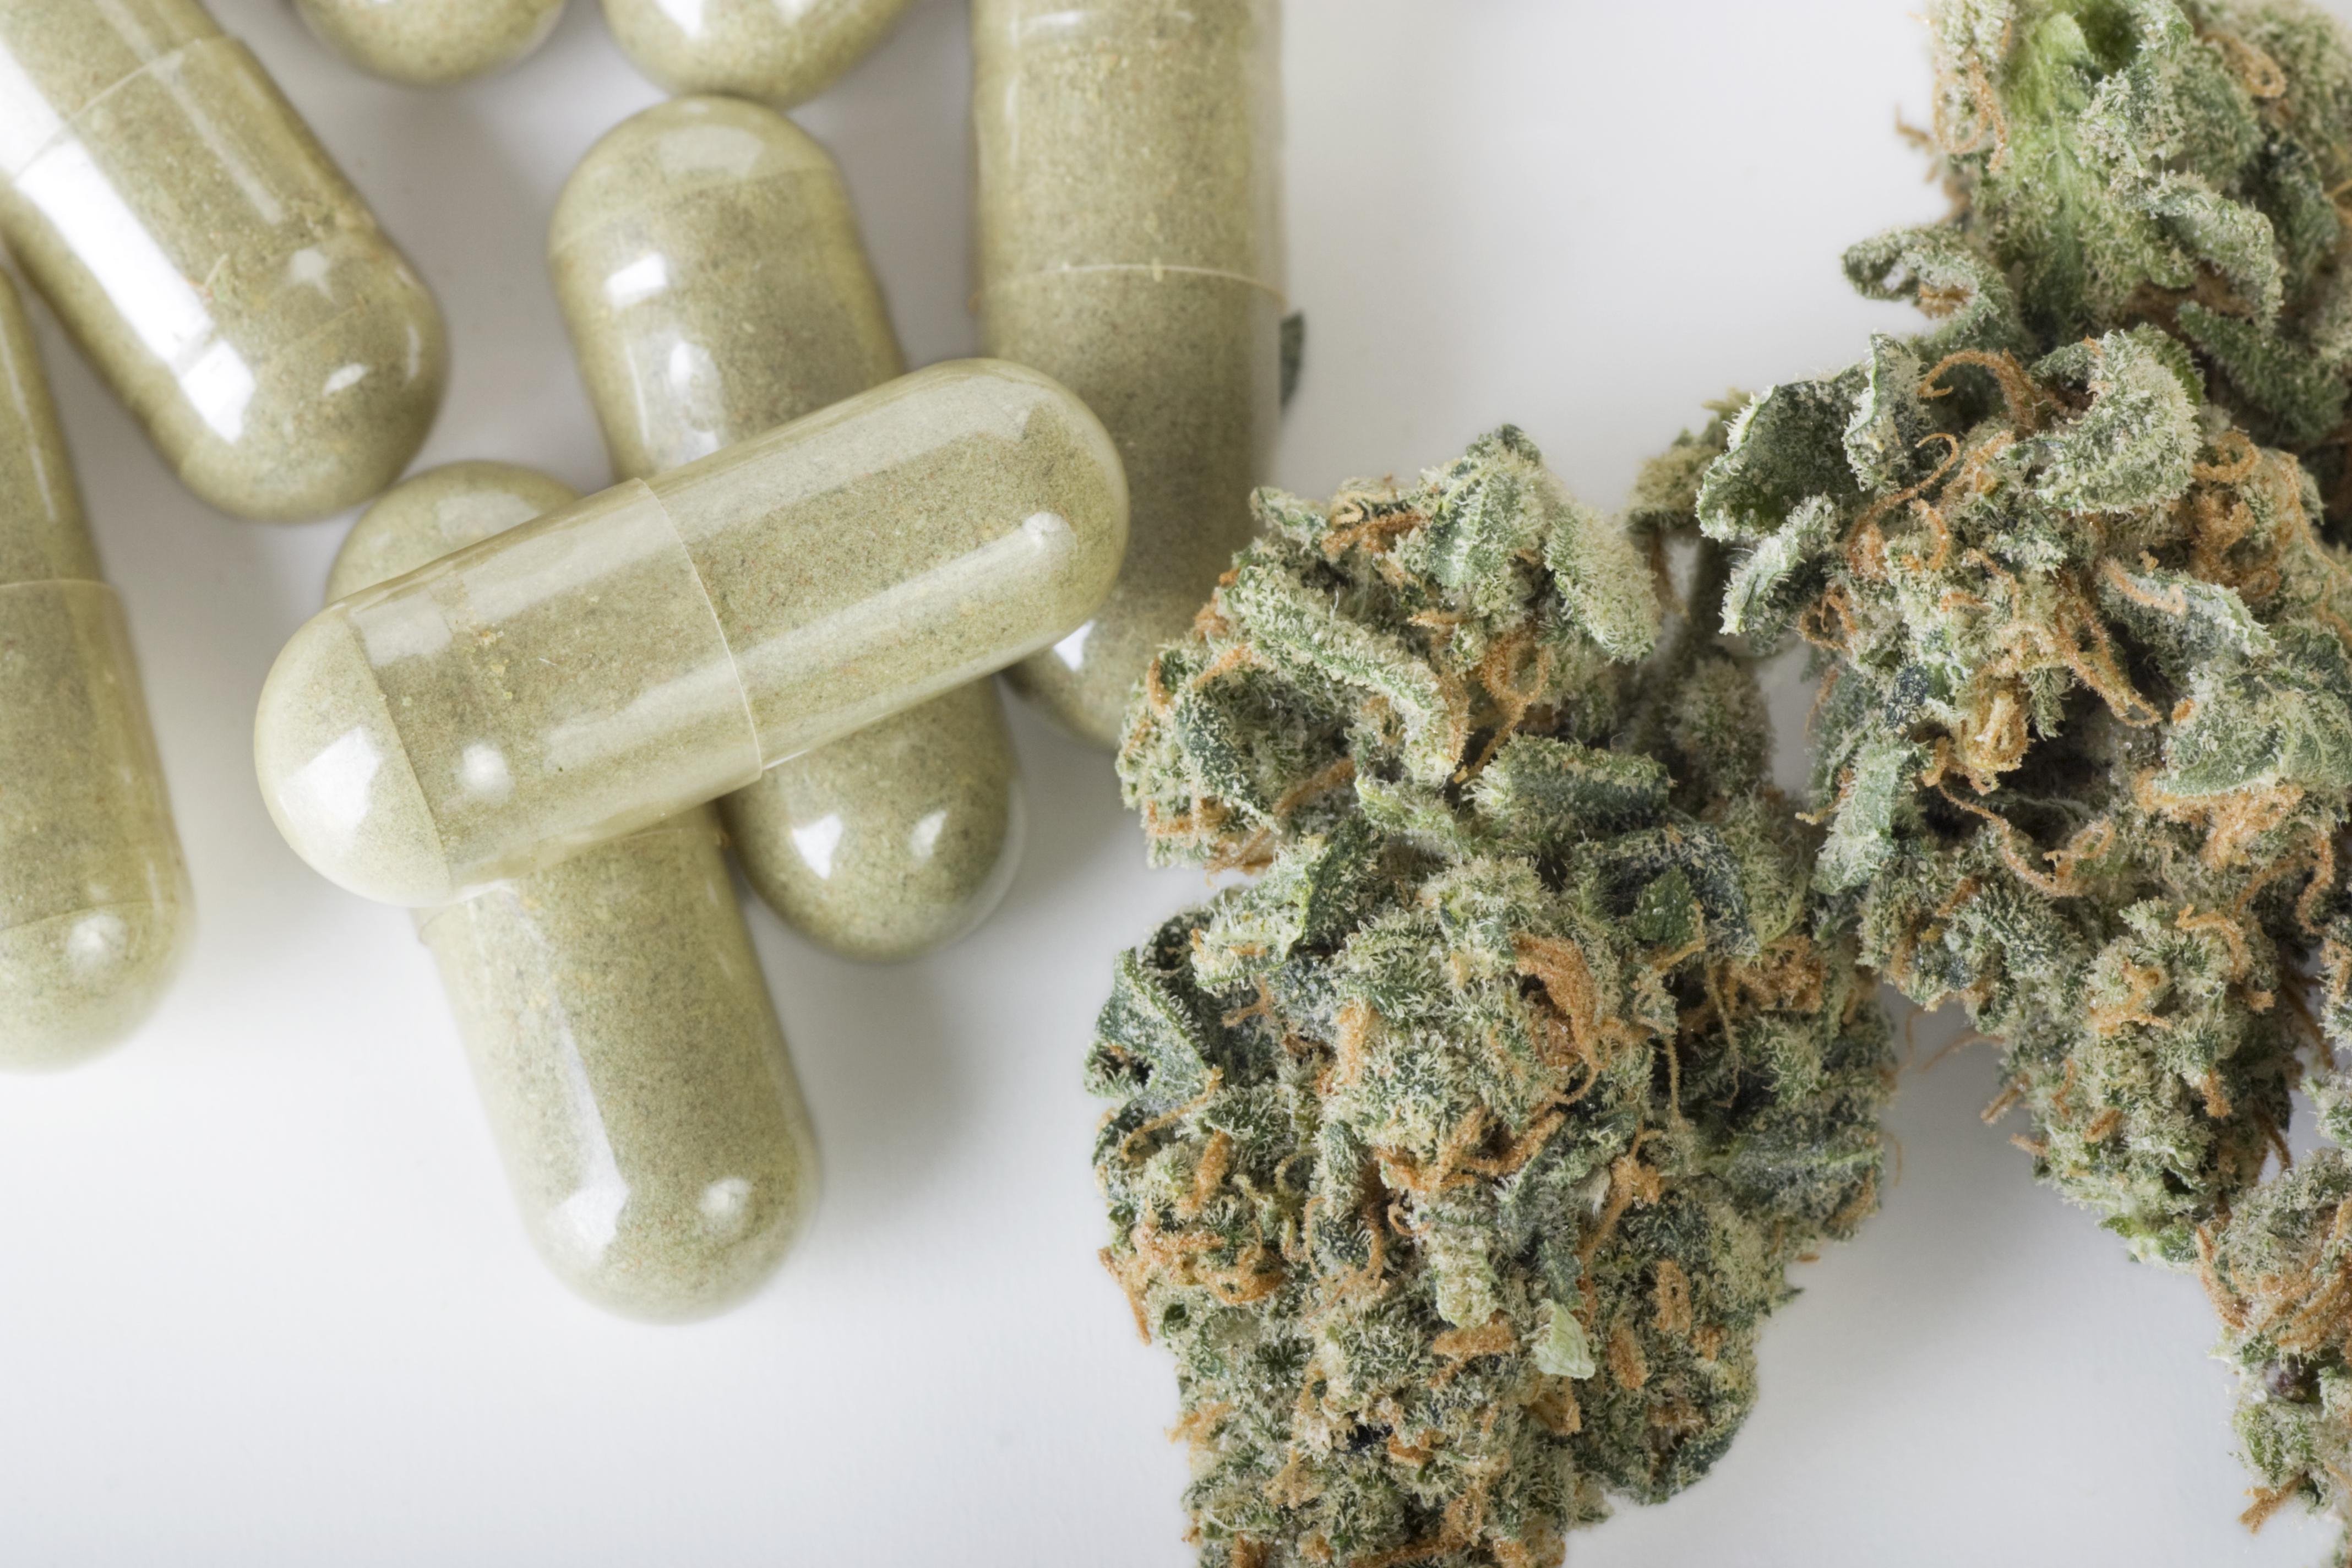 Big Pharmaceuticals VS Legal Marijuana in Arizona